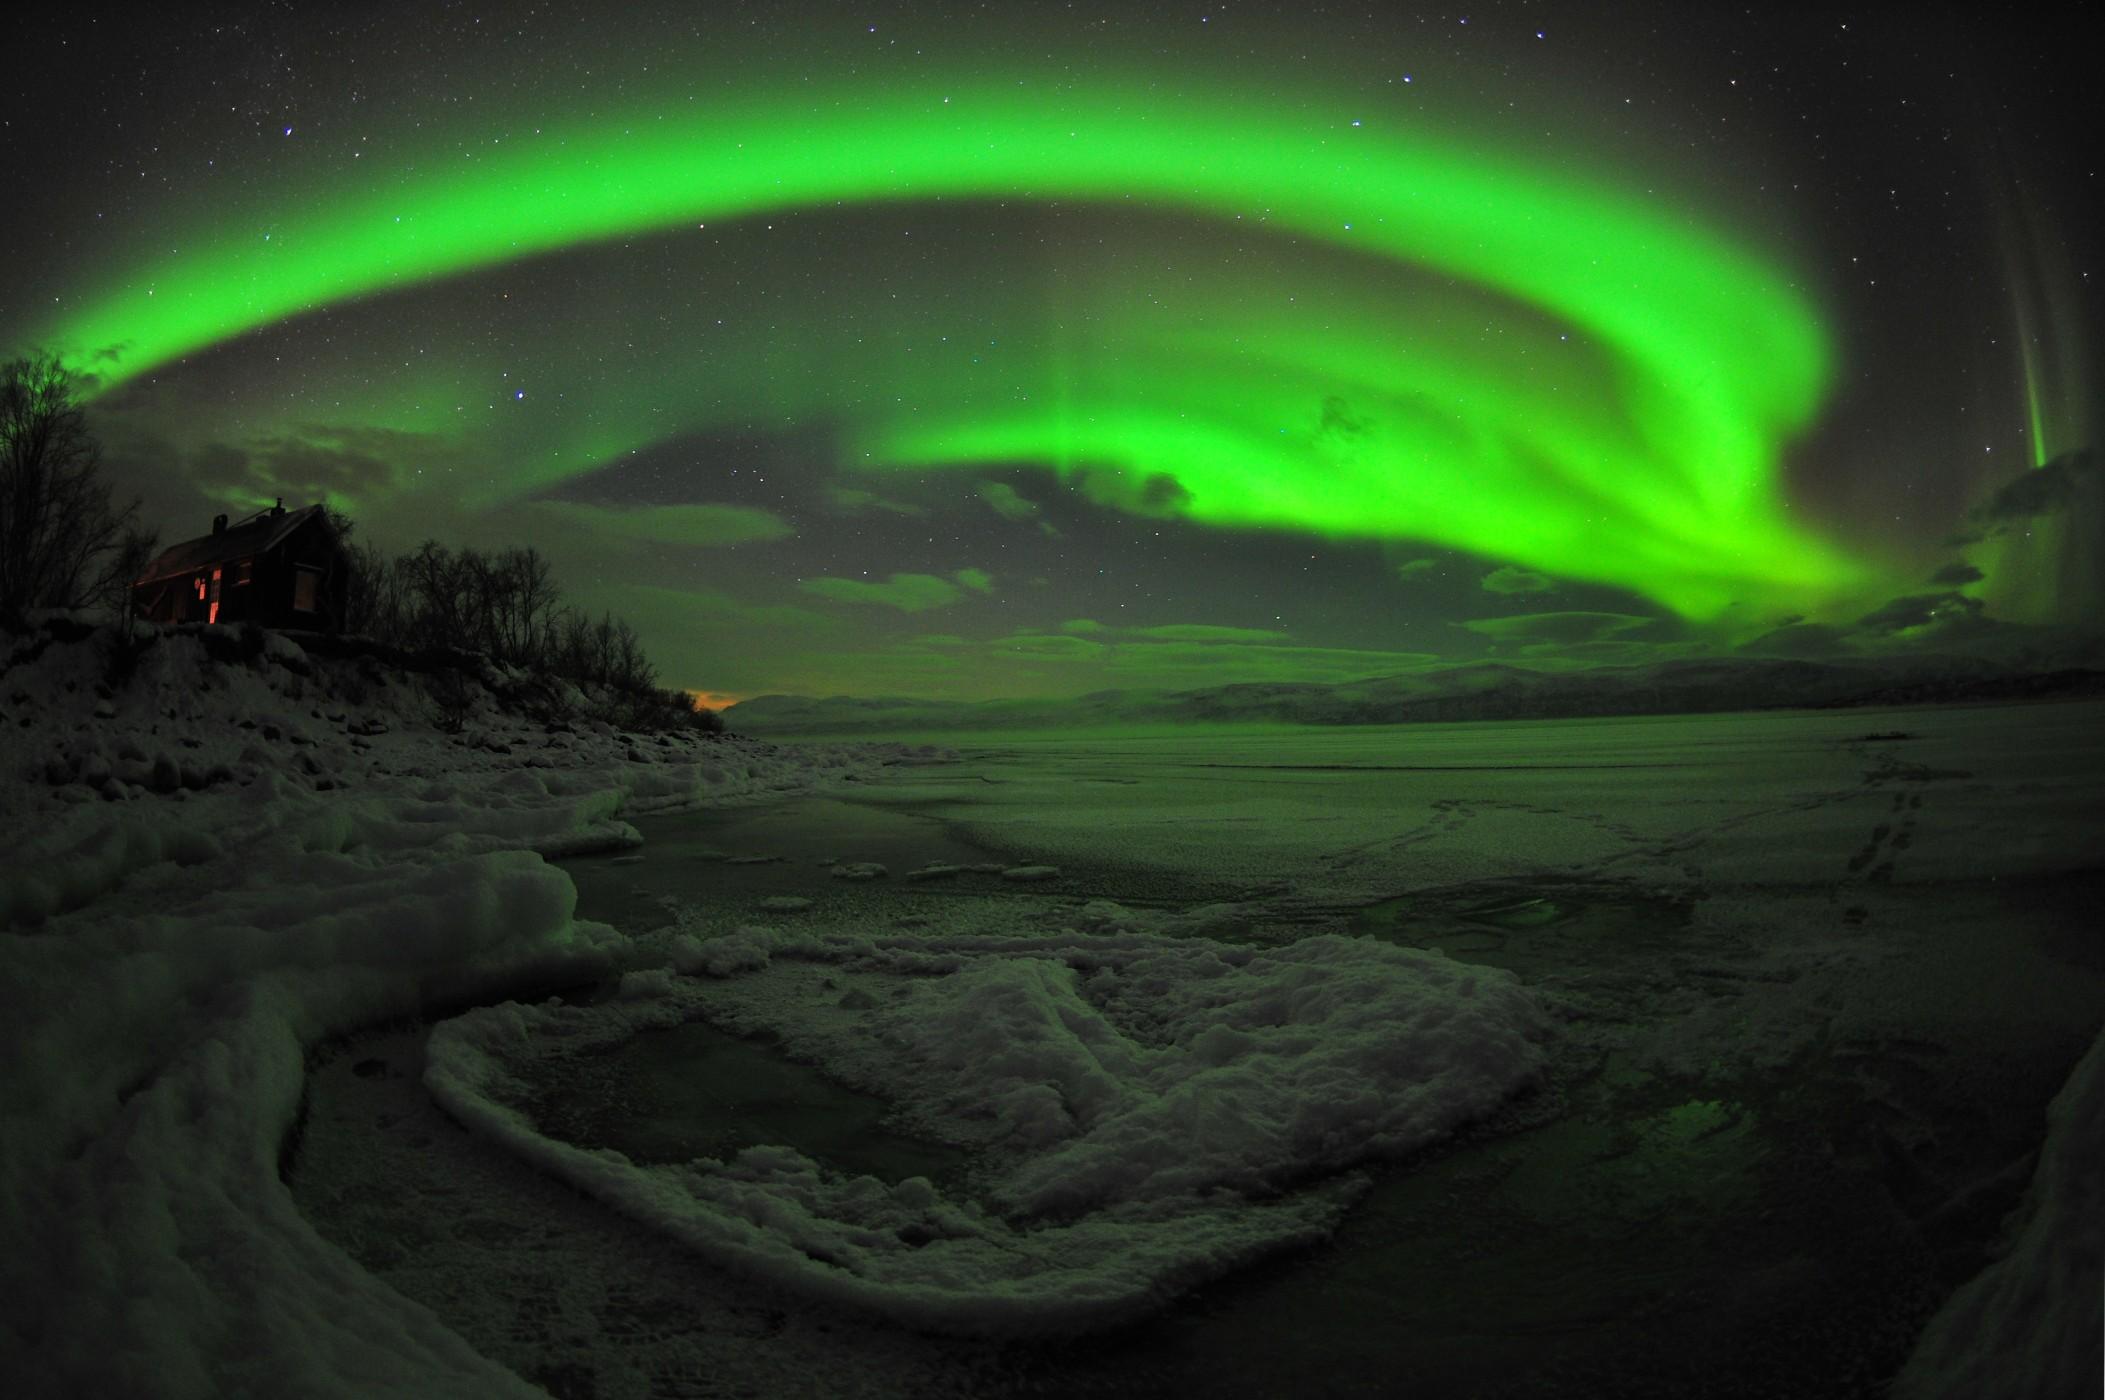 http://upload.wikimedia.org/wikipedia/commons/f/f1/Aurora-abisko-fisheye.jpg